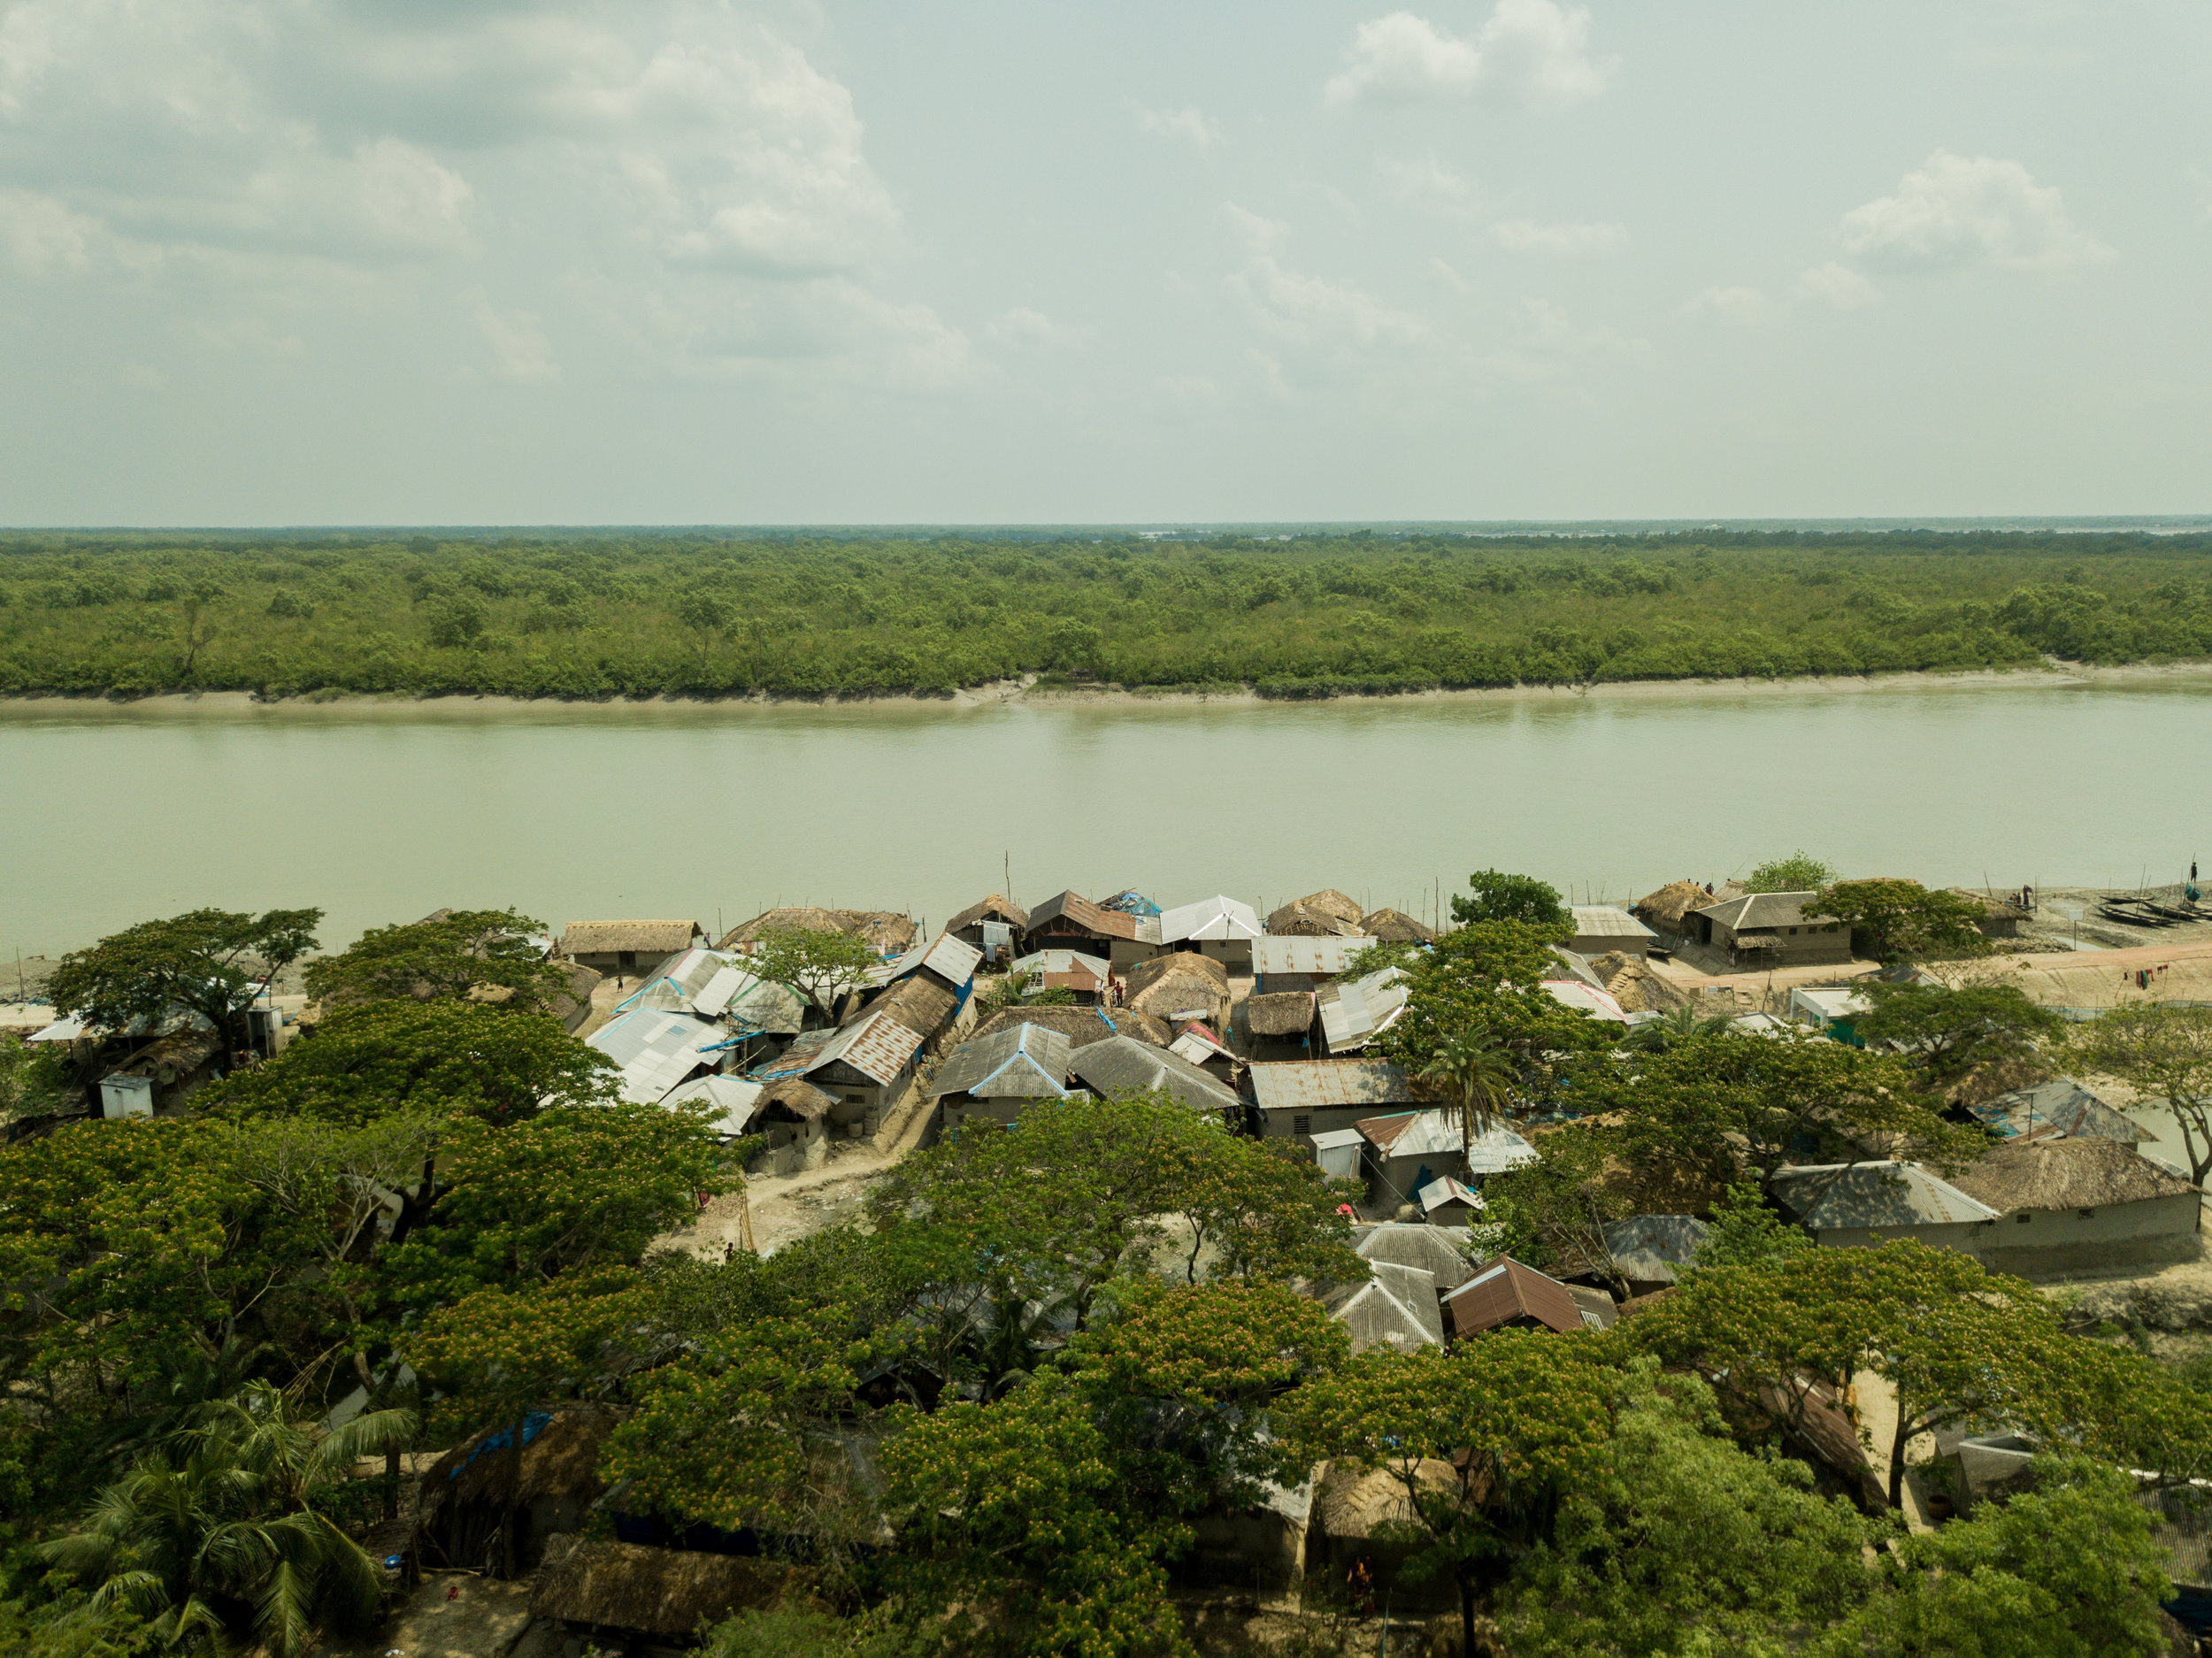 bangladesh-cyclone-shelter-mangrove-planting-sundurbans-Photo-by-Aaron-Minks-DJI_0053.jpg